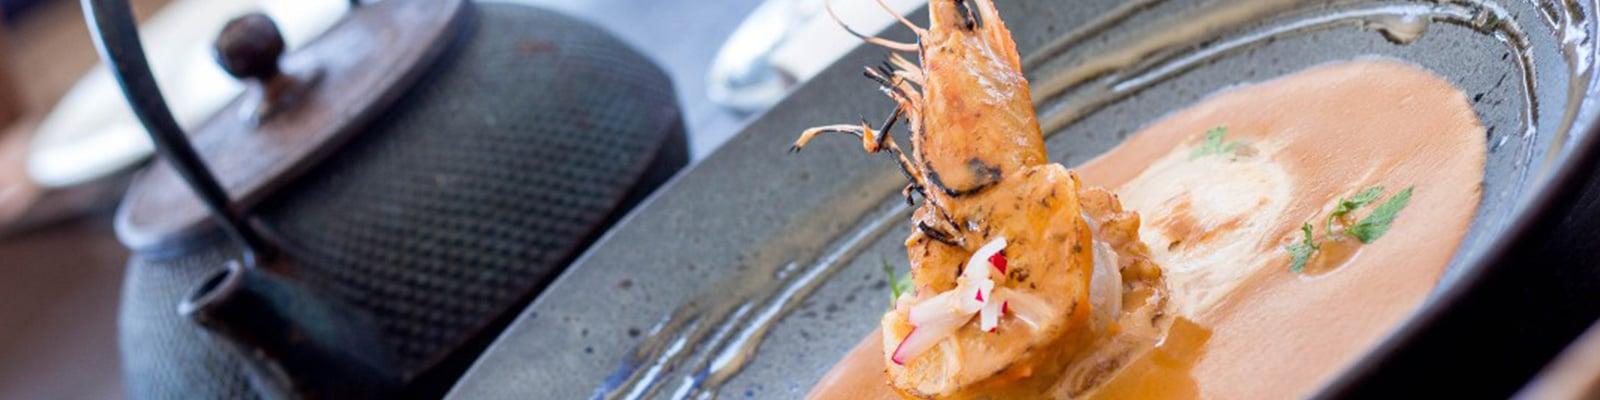 At-Sea-Restaurant-Bonaire-sliderimage-7.jpg